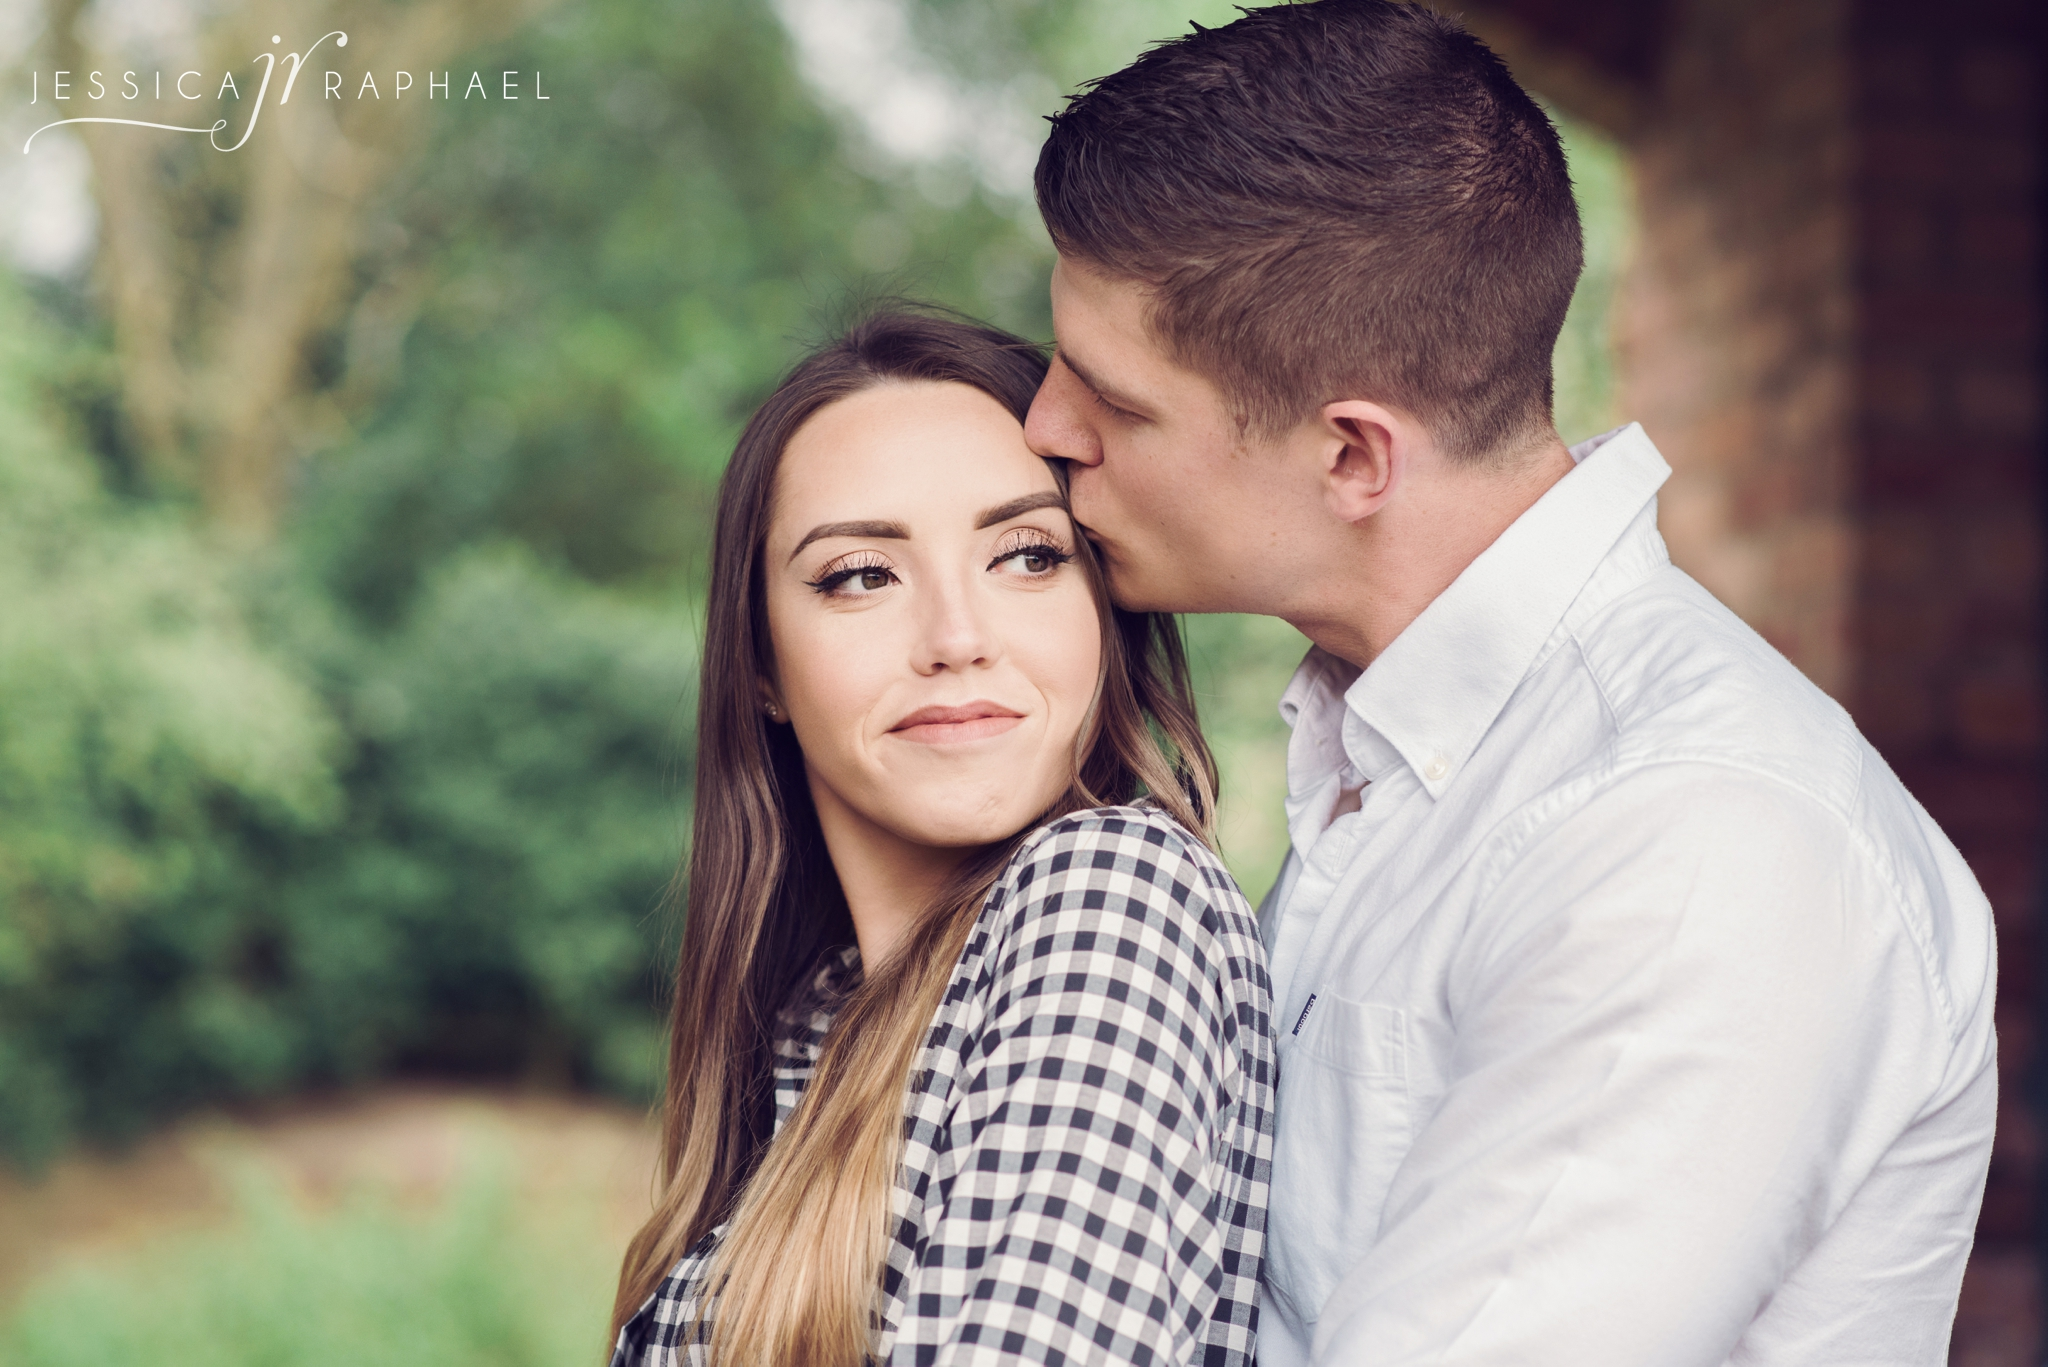 engagement-photography-spring-jessica-raphael-photography-hatton-warwickshire-wedding-photographer